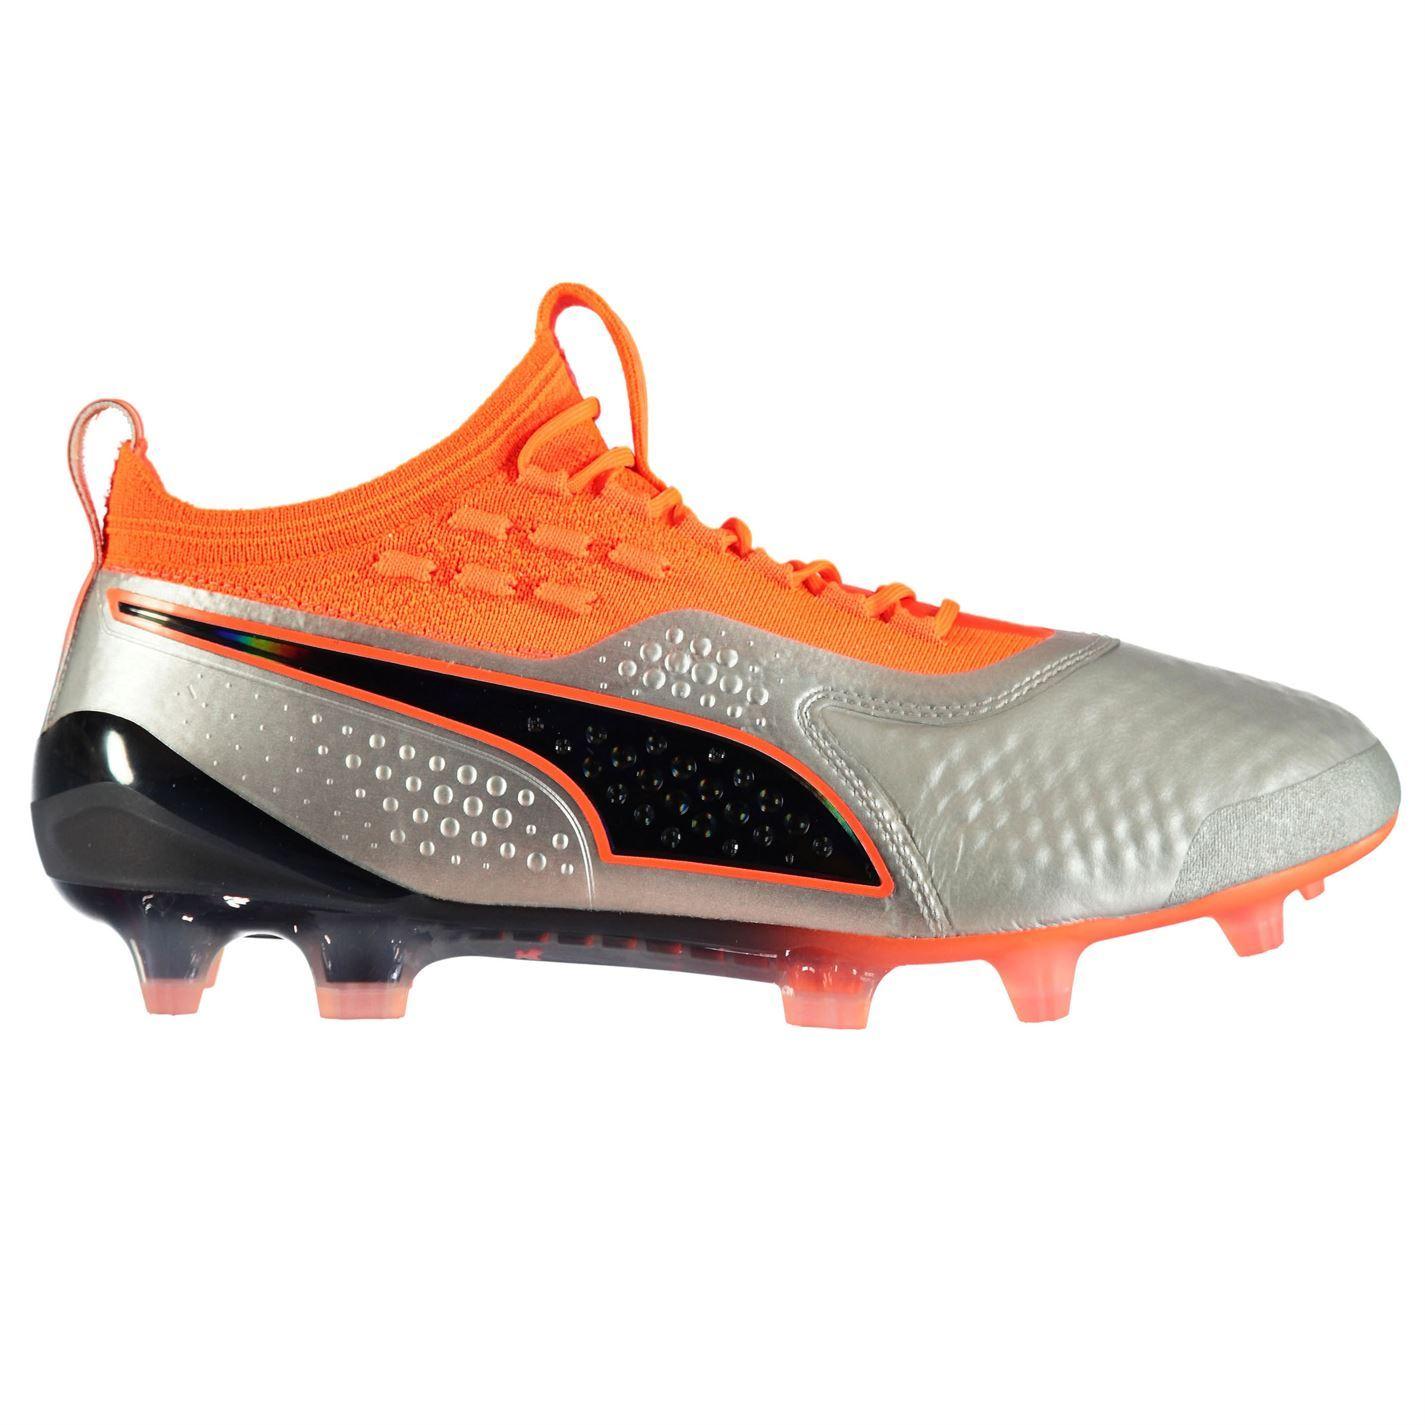 miniature 7 - PUMA 1 Fg Firm Ground Chaussures De Football Homme Football Chaussures Crampons